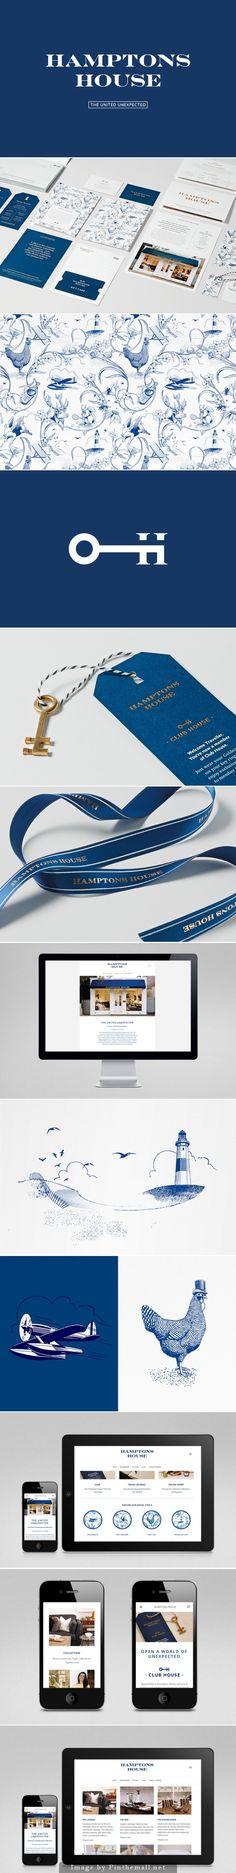 Hamptons House | Moffitt.Moffitt. Curated by: Transition Marketing Services | Okanagan Small Business Marketing Branding Solutions. http://www.transitionmarketing.ca